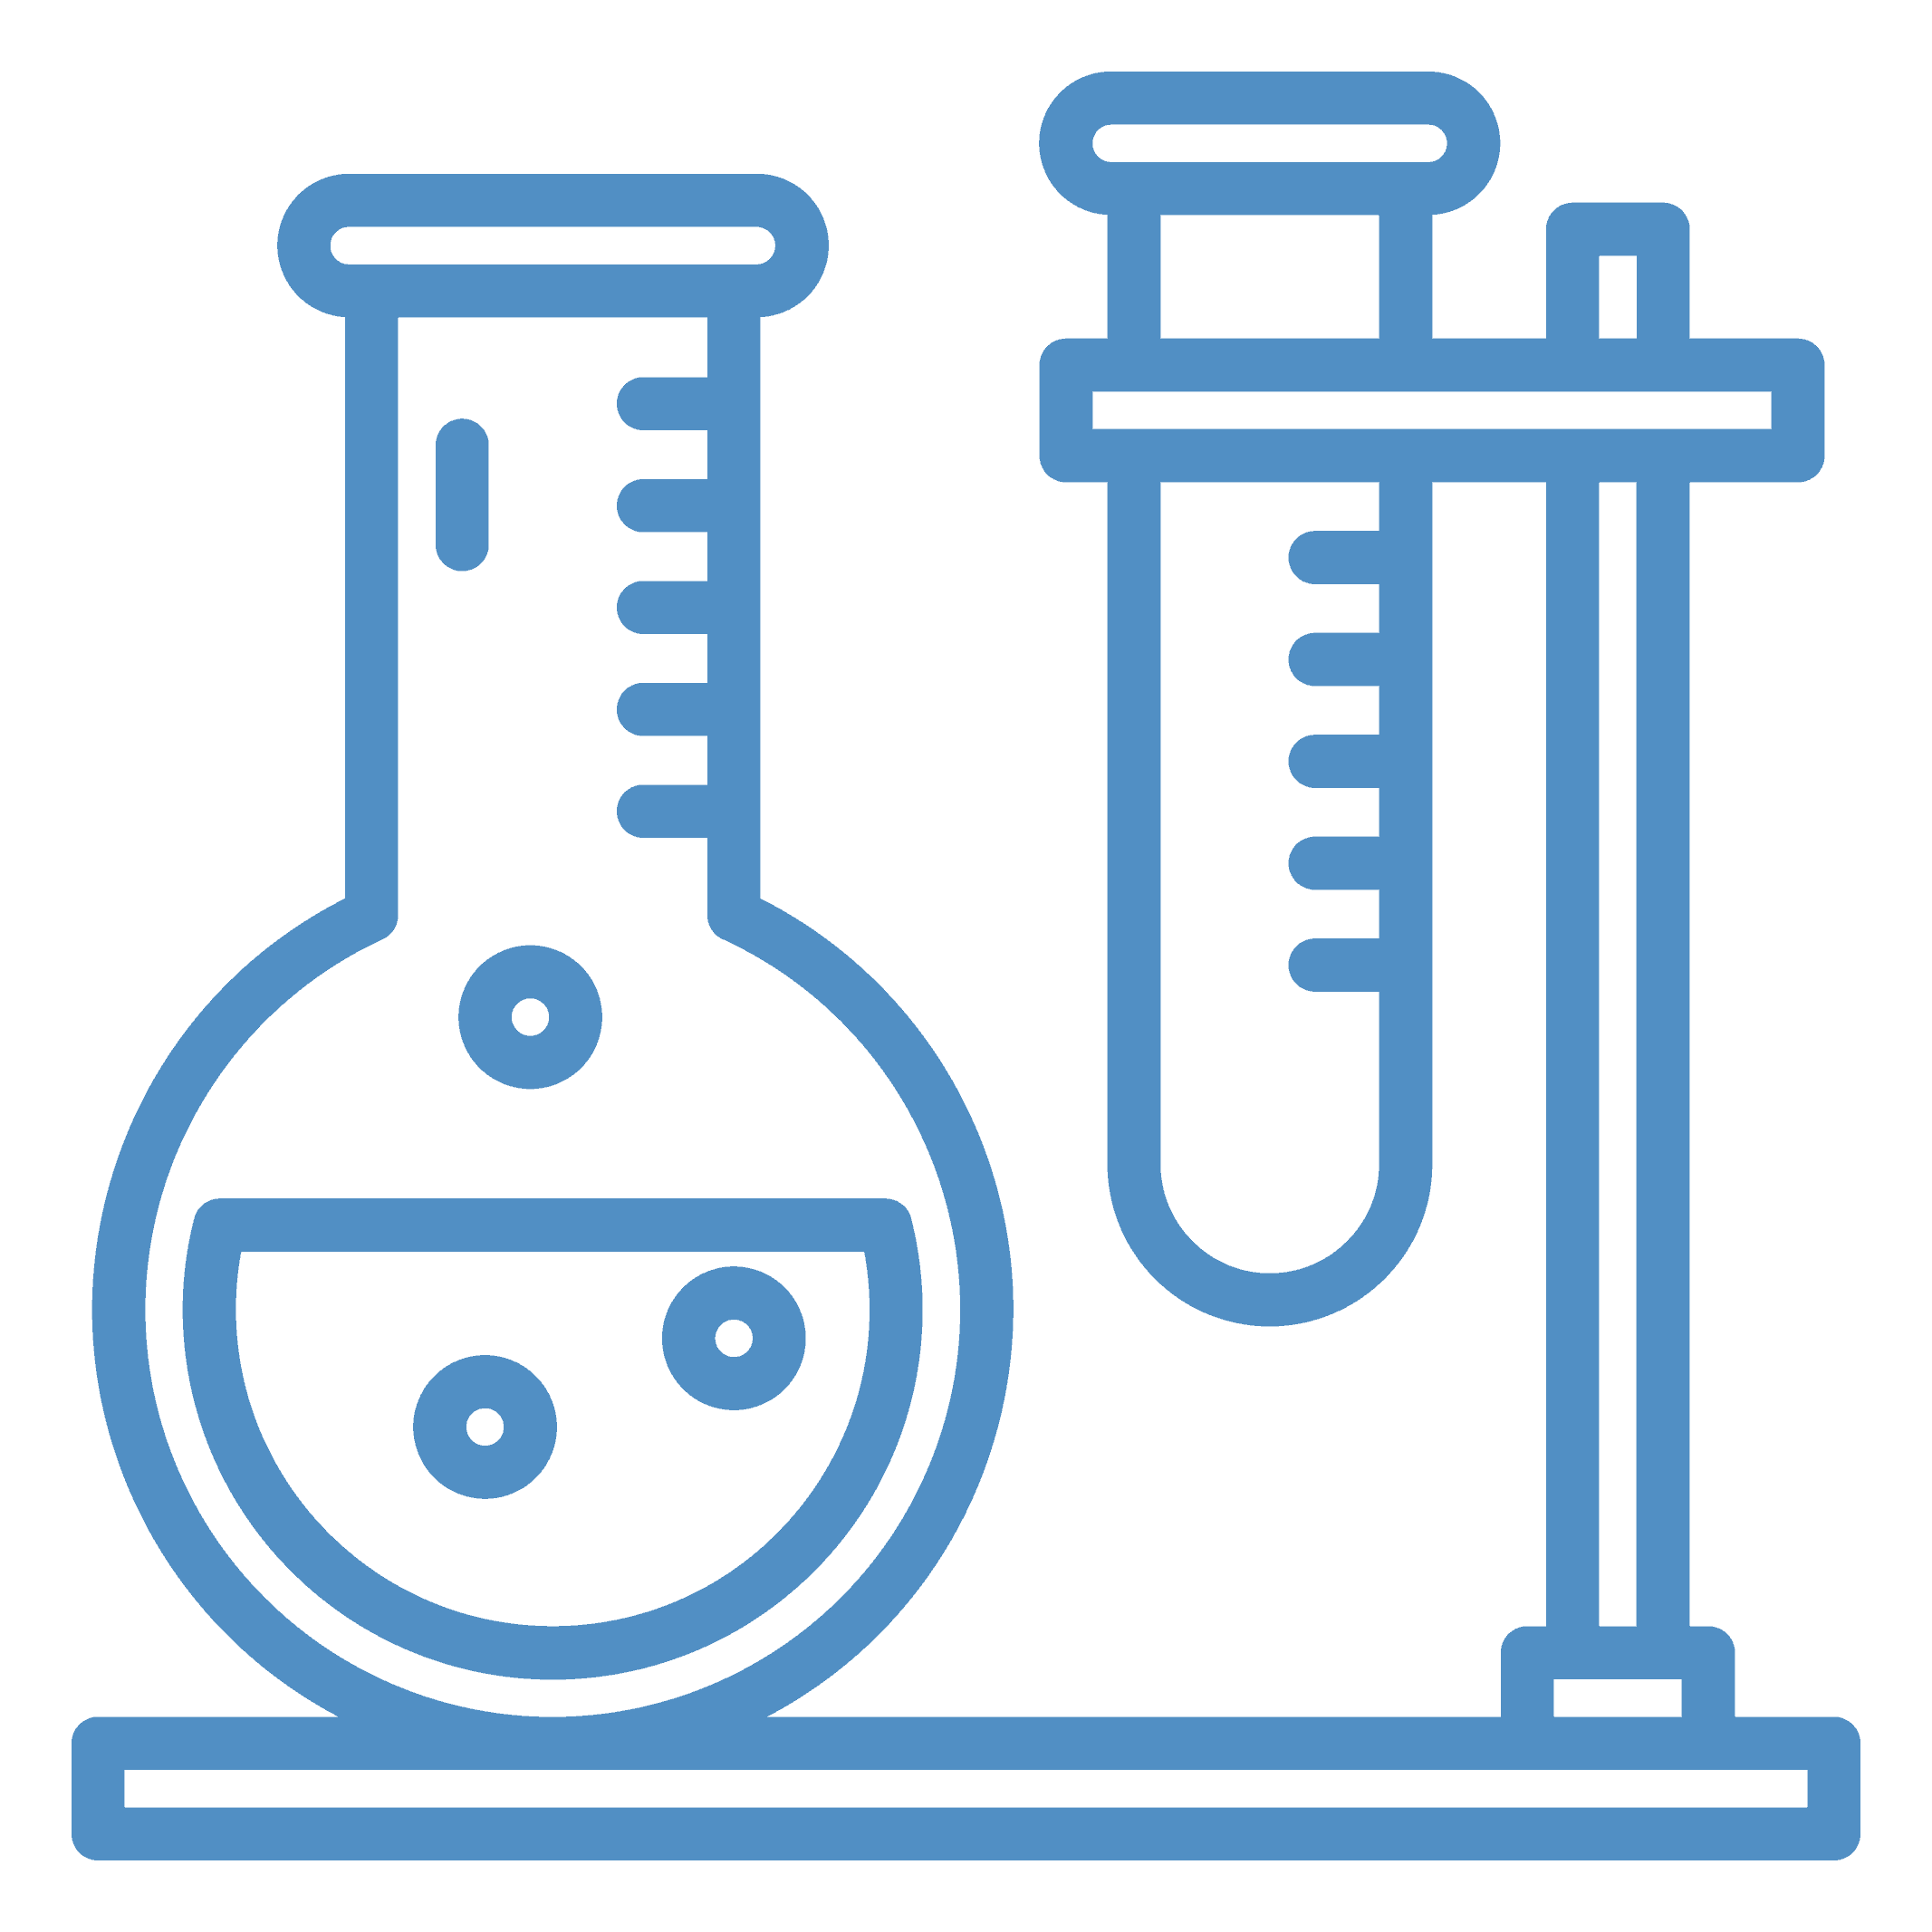 lab-tool